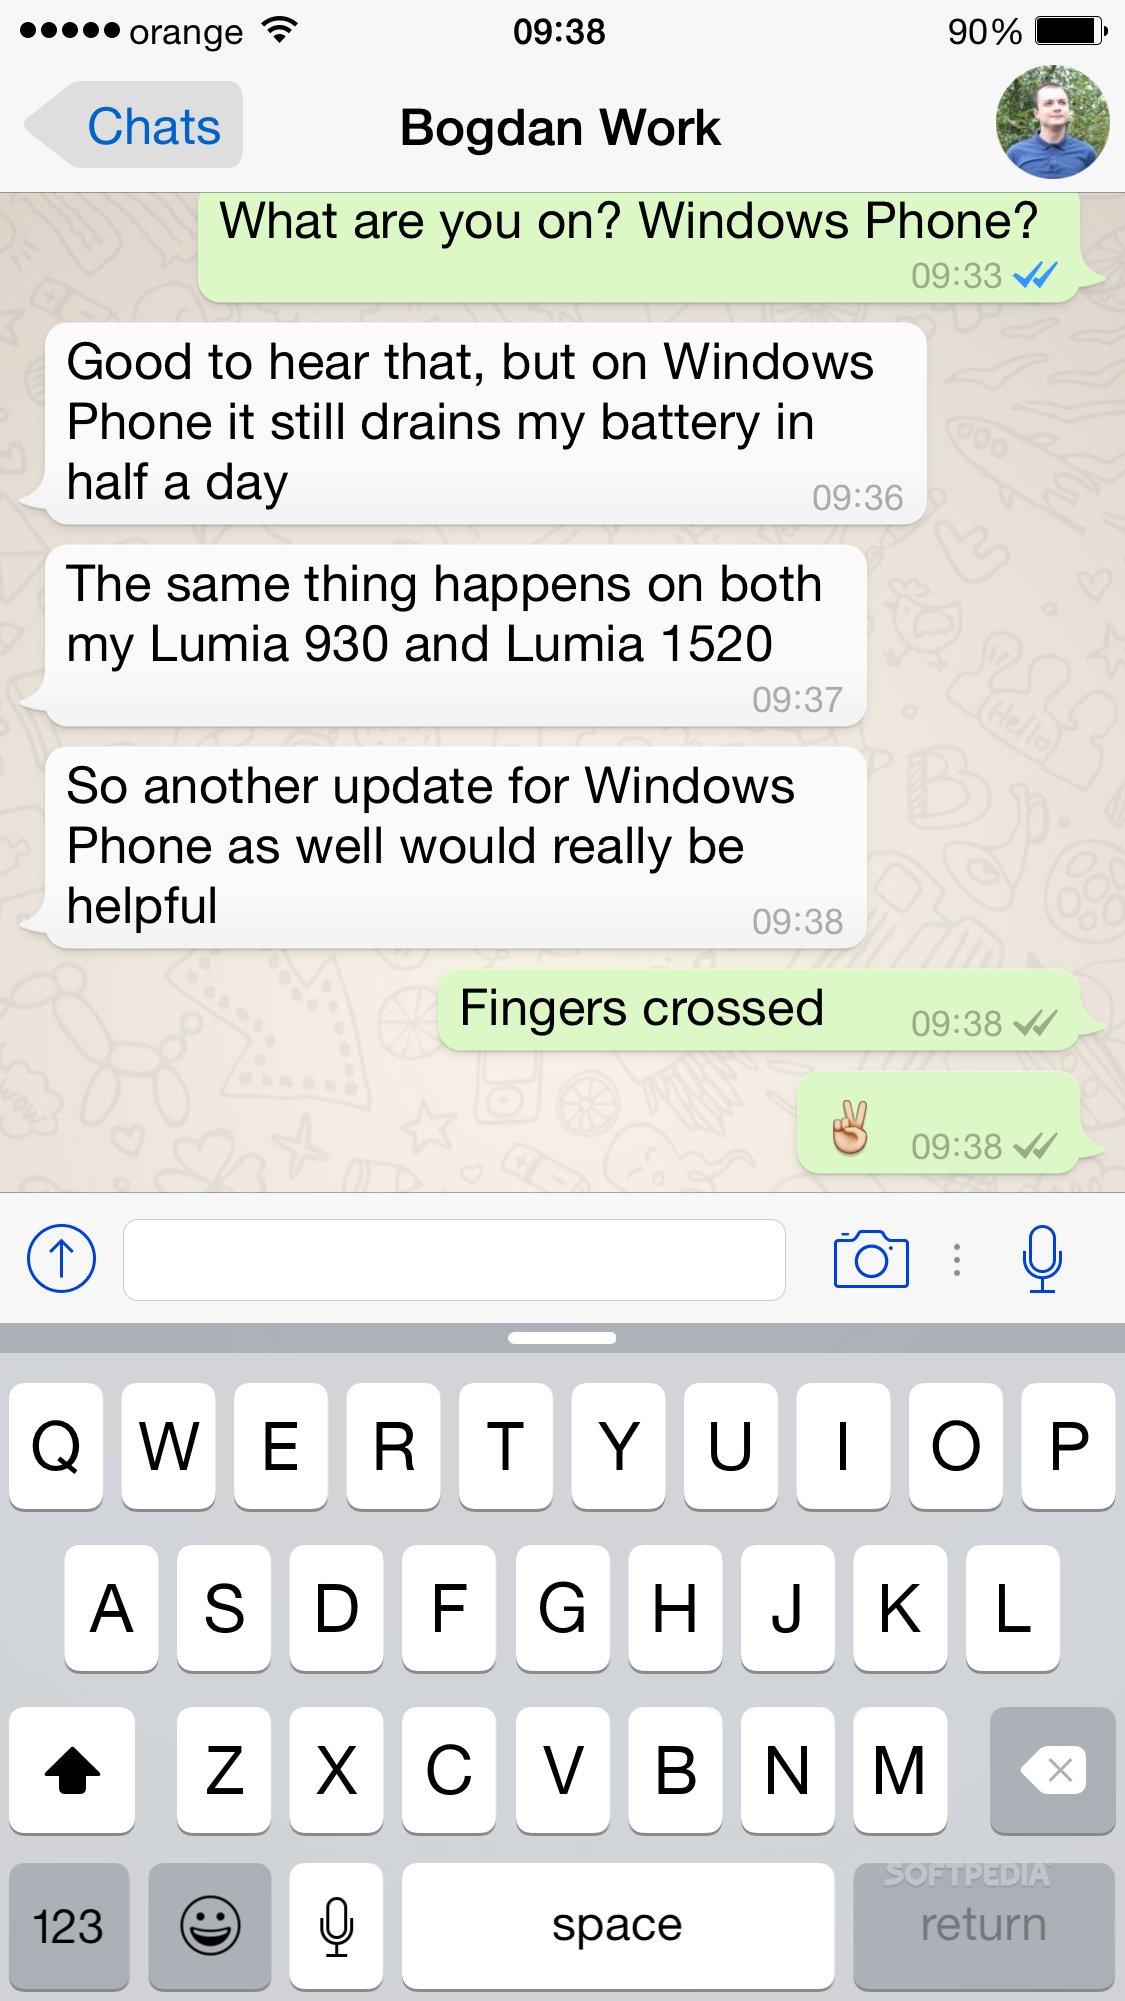 Download whatsapp watusi ipa for ios 10 iphone, here's how.